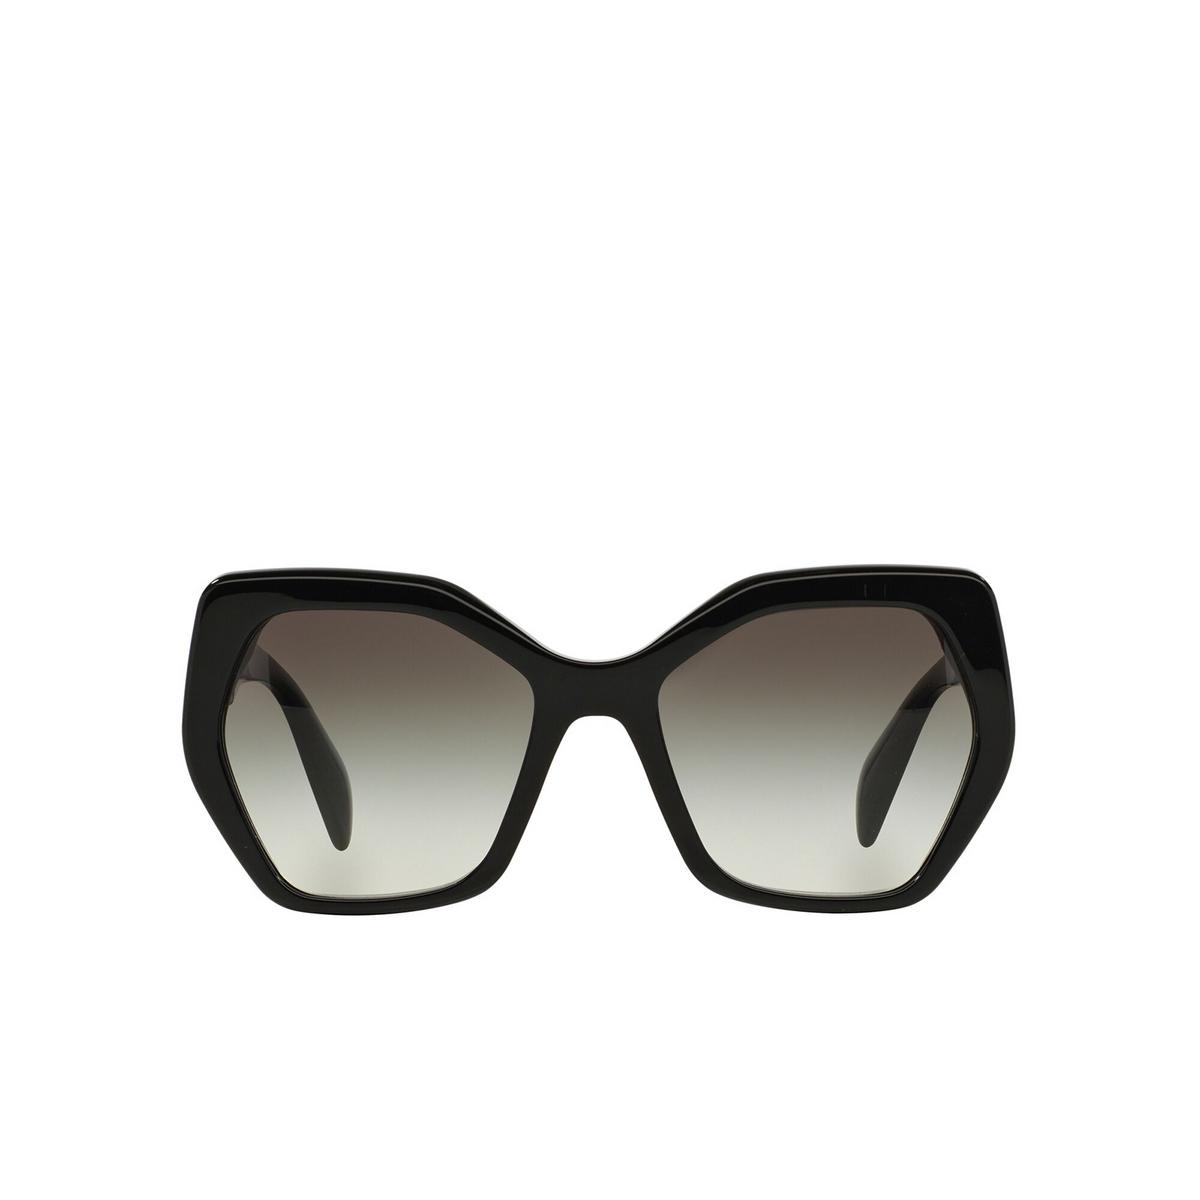 Prada® Irregular Sunglasses: Heritage PR 16RS color Black 1AB0A7 - front view.